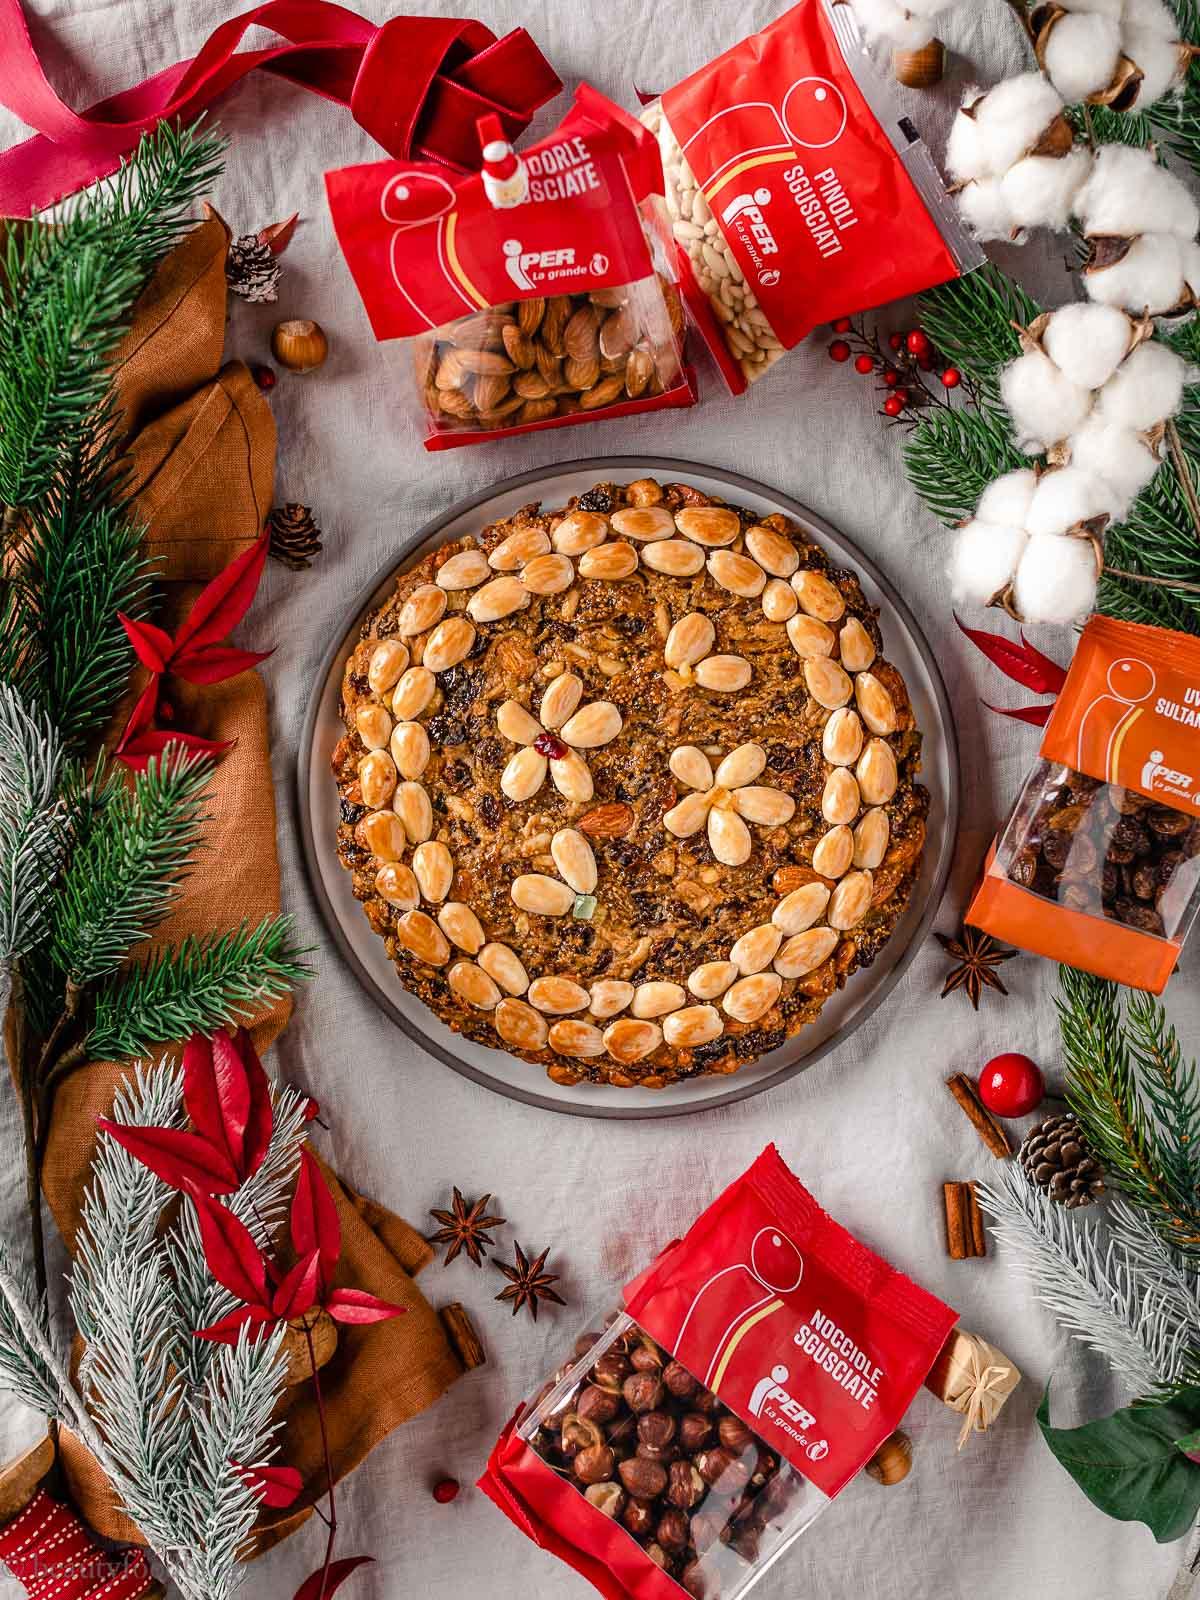 Ricetta Zelten Tirolese Originale Dolce di Natale del SudTirol vegan Iper